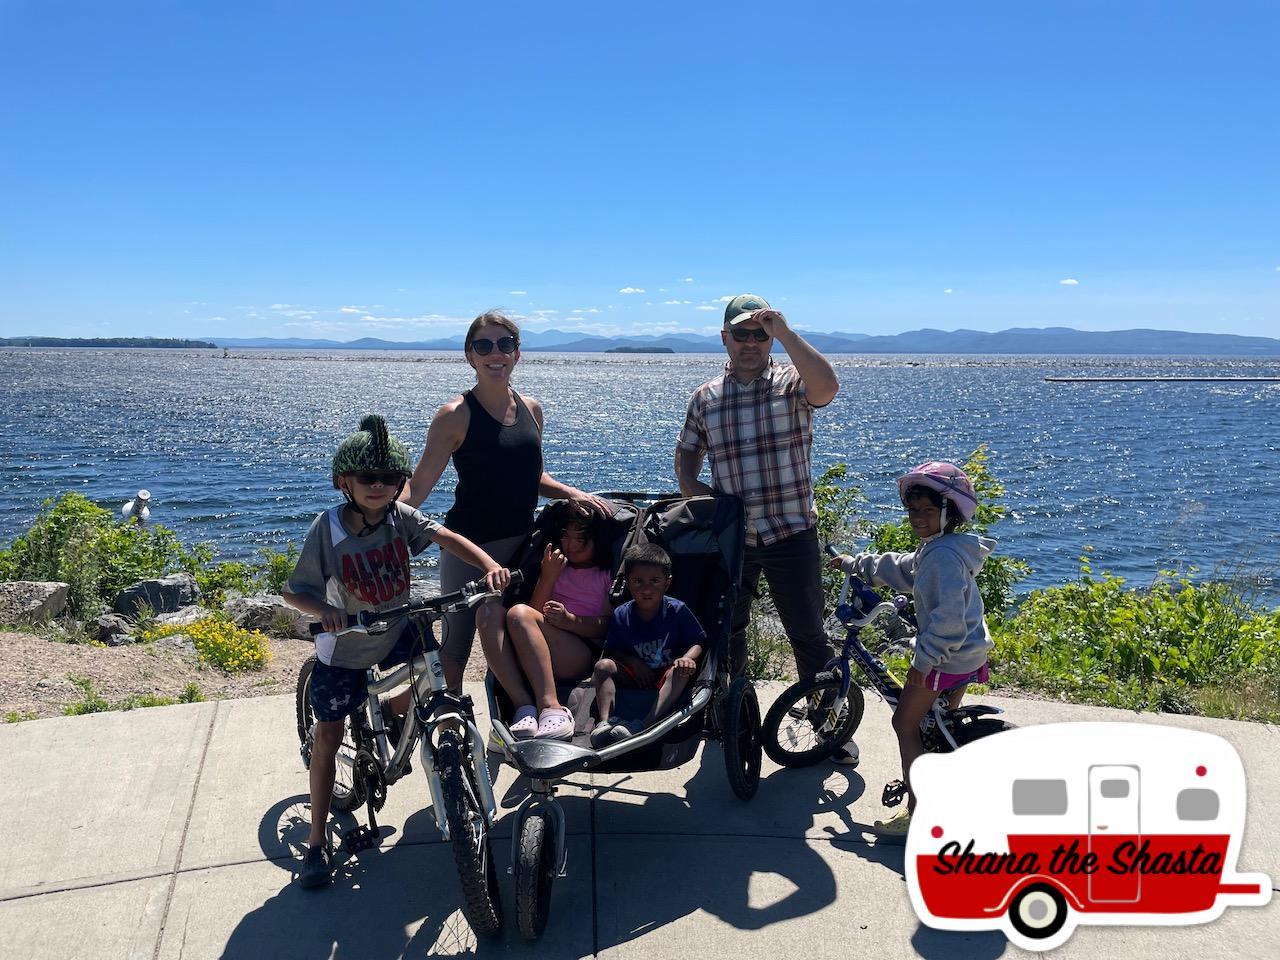 Lakeside-Biking-on-Lake-Champlain